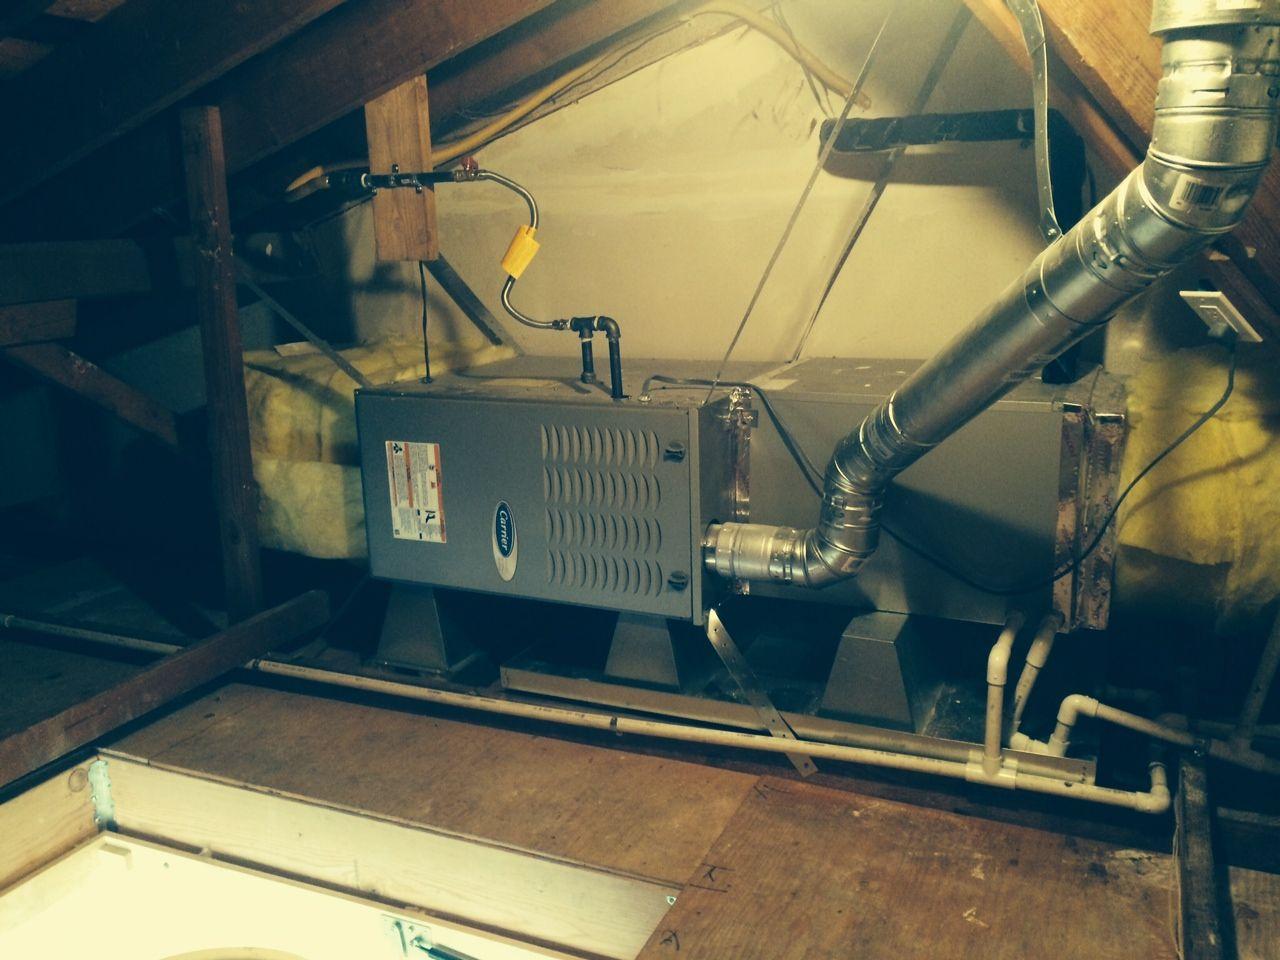 Carrier Furnace, horizontal attic installation, great job